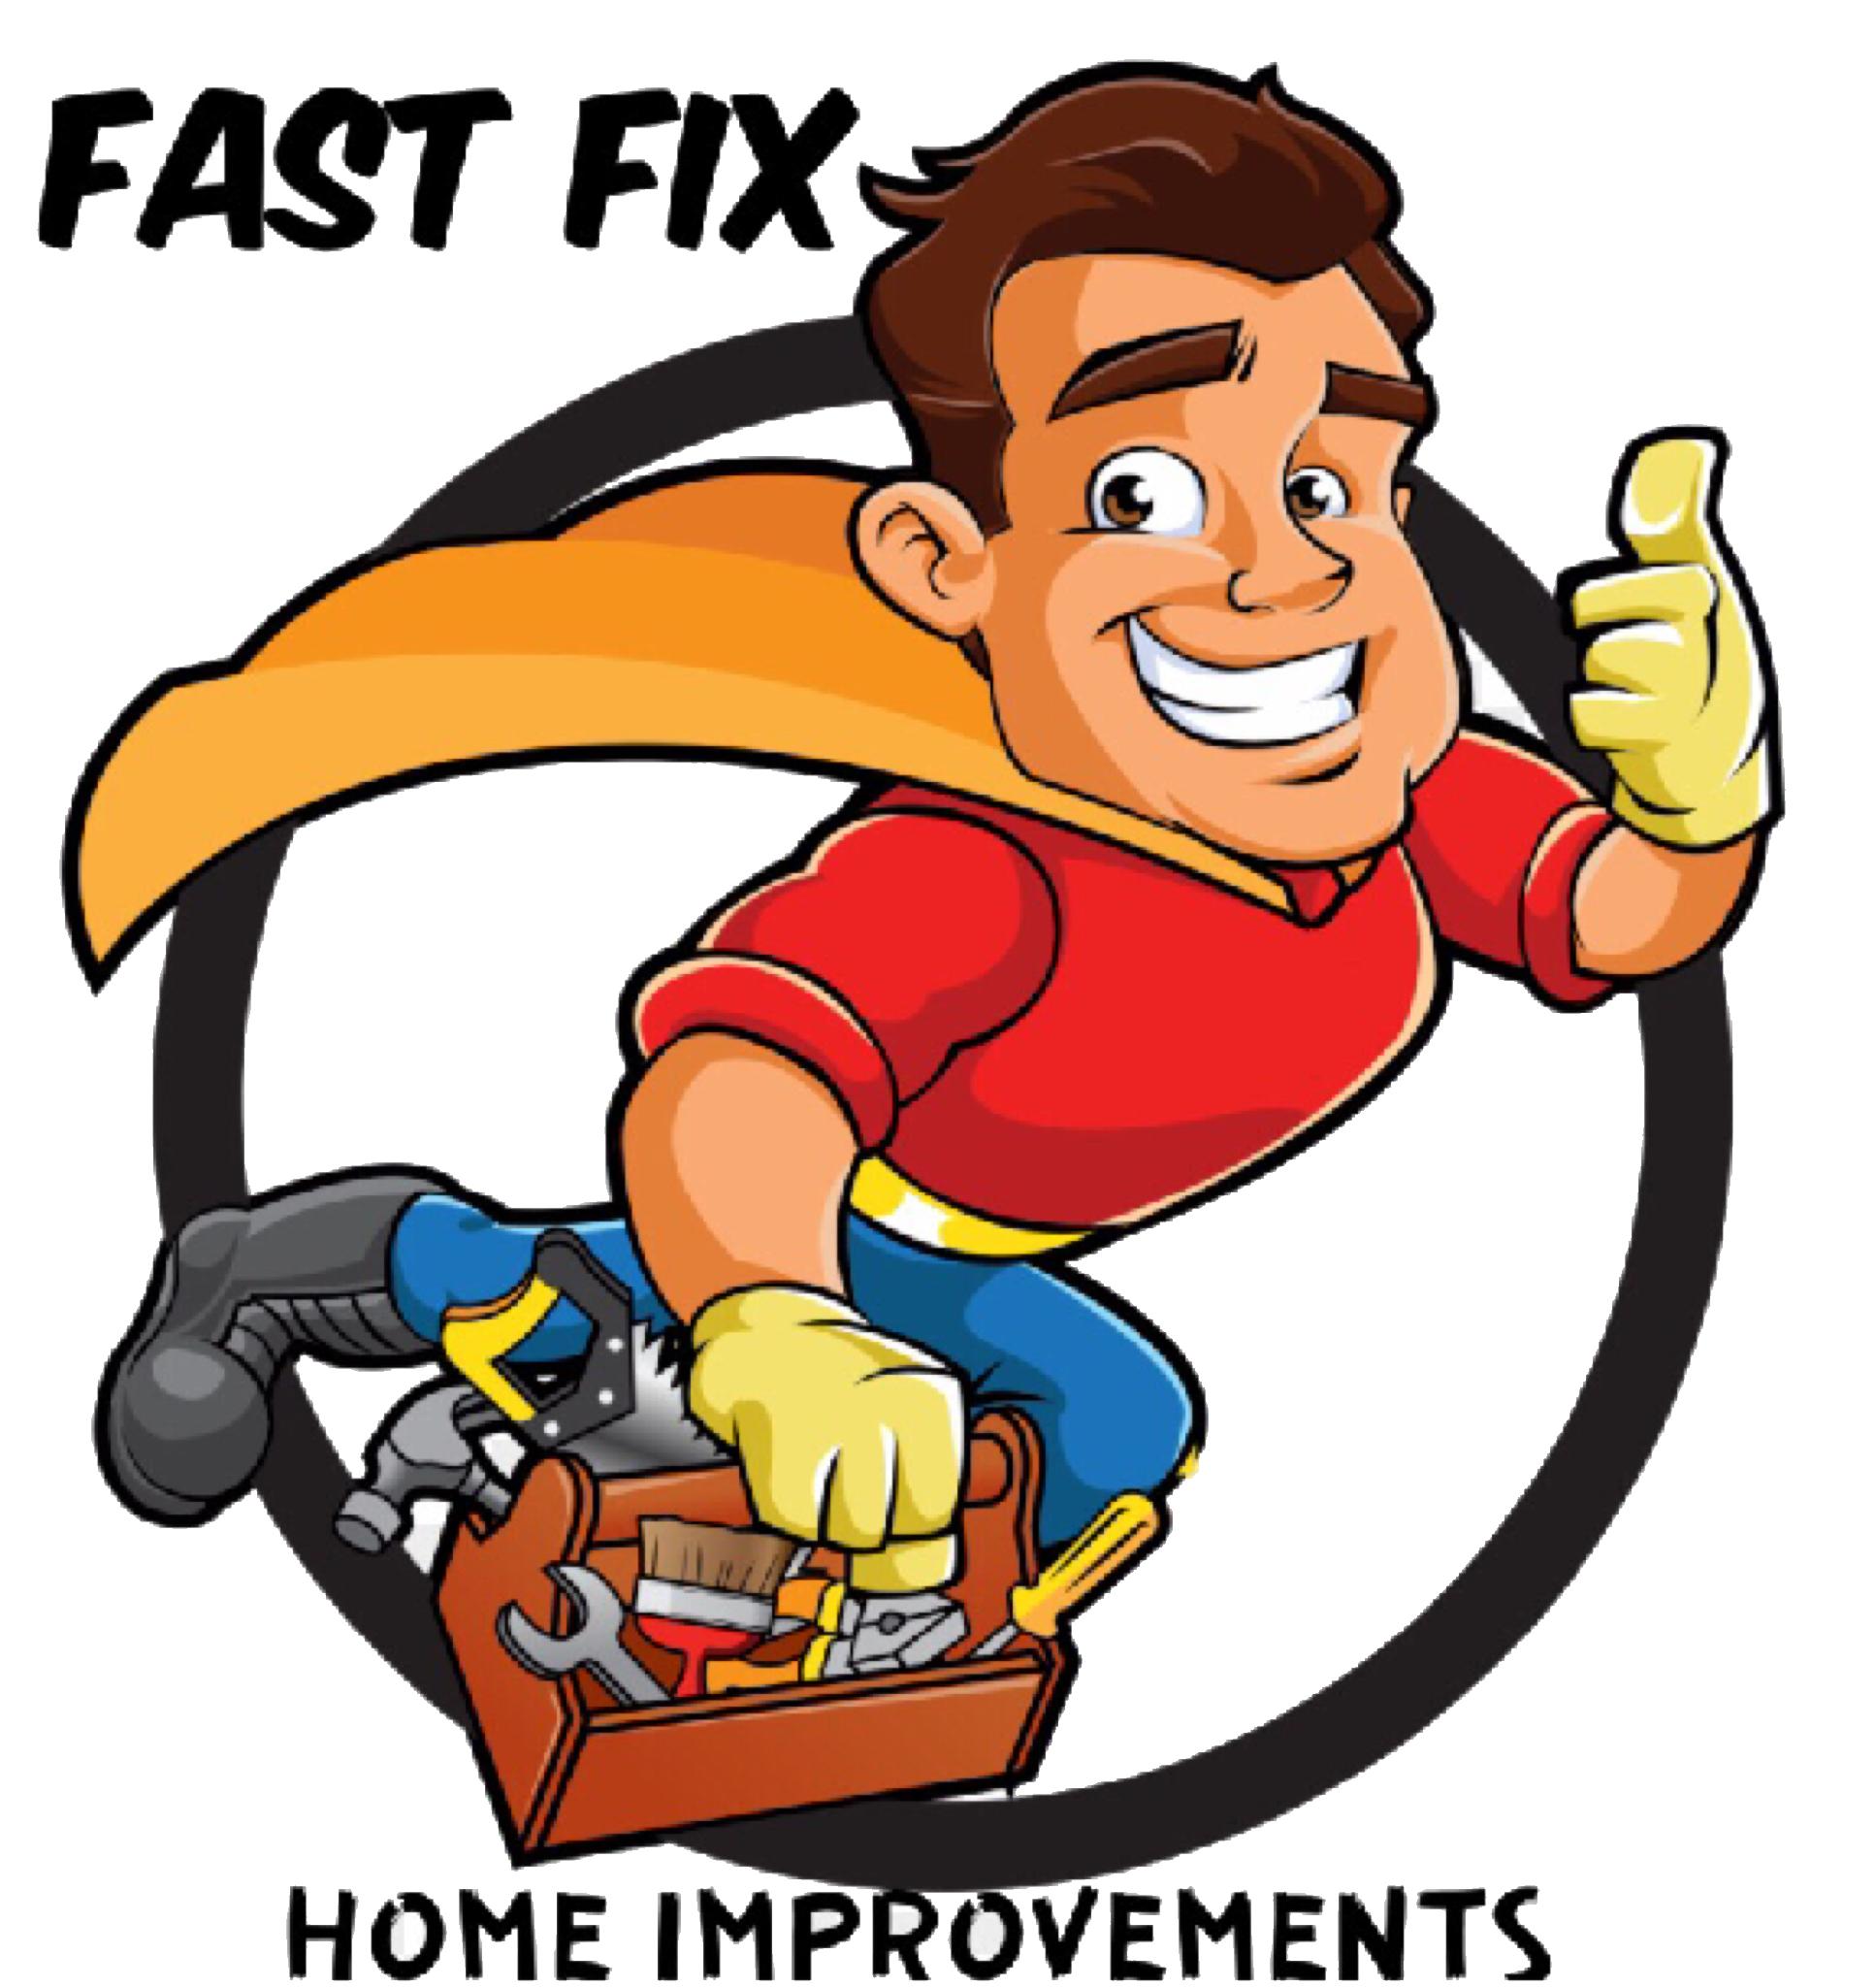 Fast Fix Home Improvements